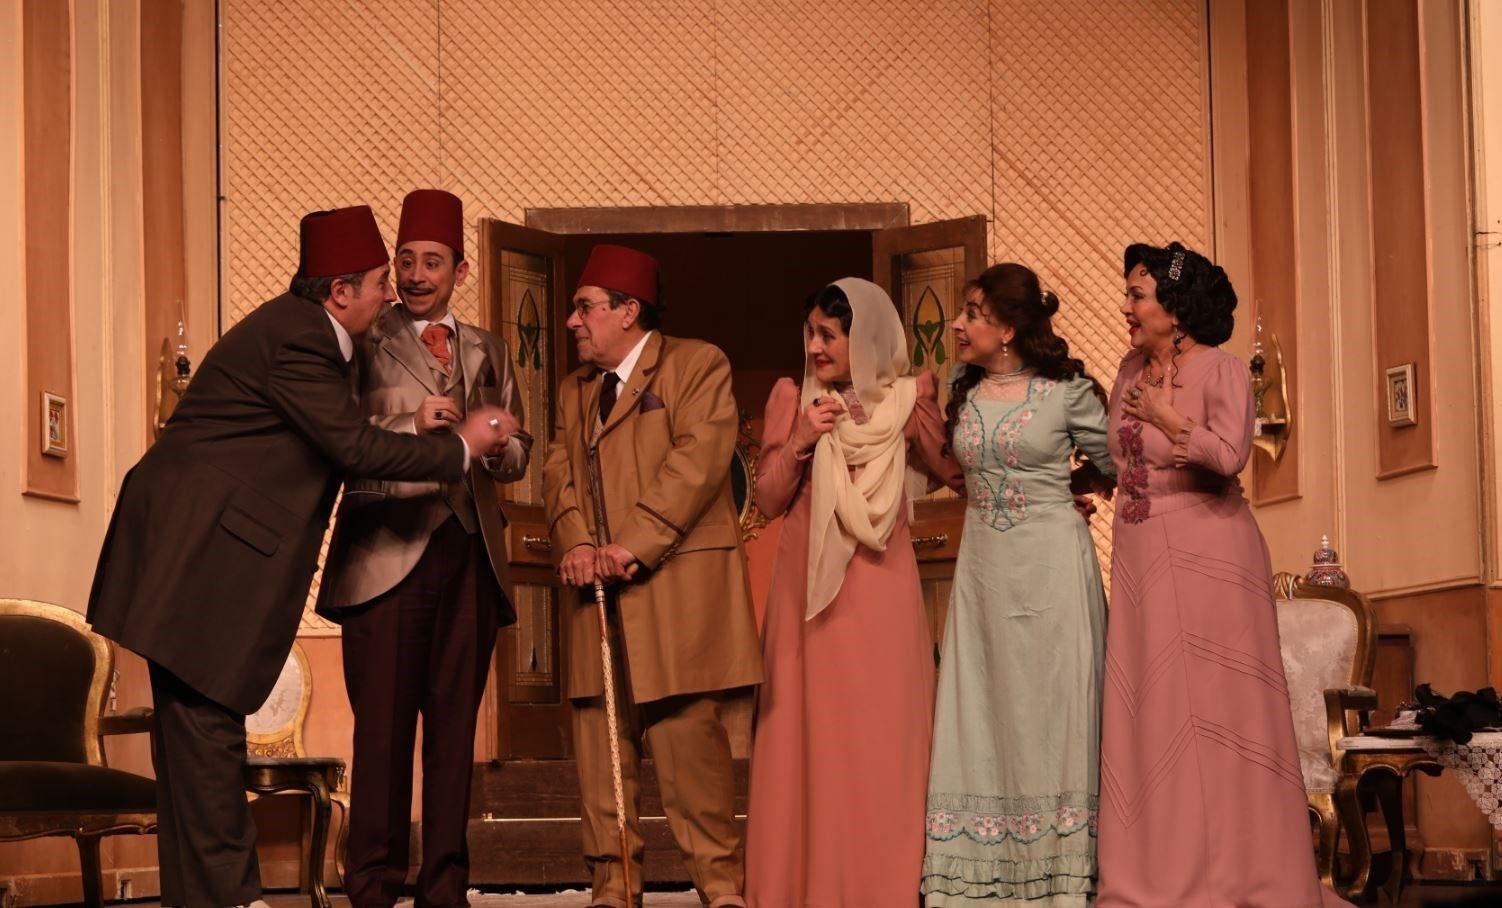 A scene from the play u201cHisse-i u015eayiau201d (u201cBir Evlilik  Komedisiu201d) (u201cExclusive Share / A Marriage Comedyu201d).